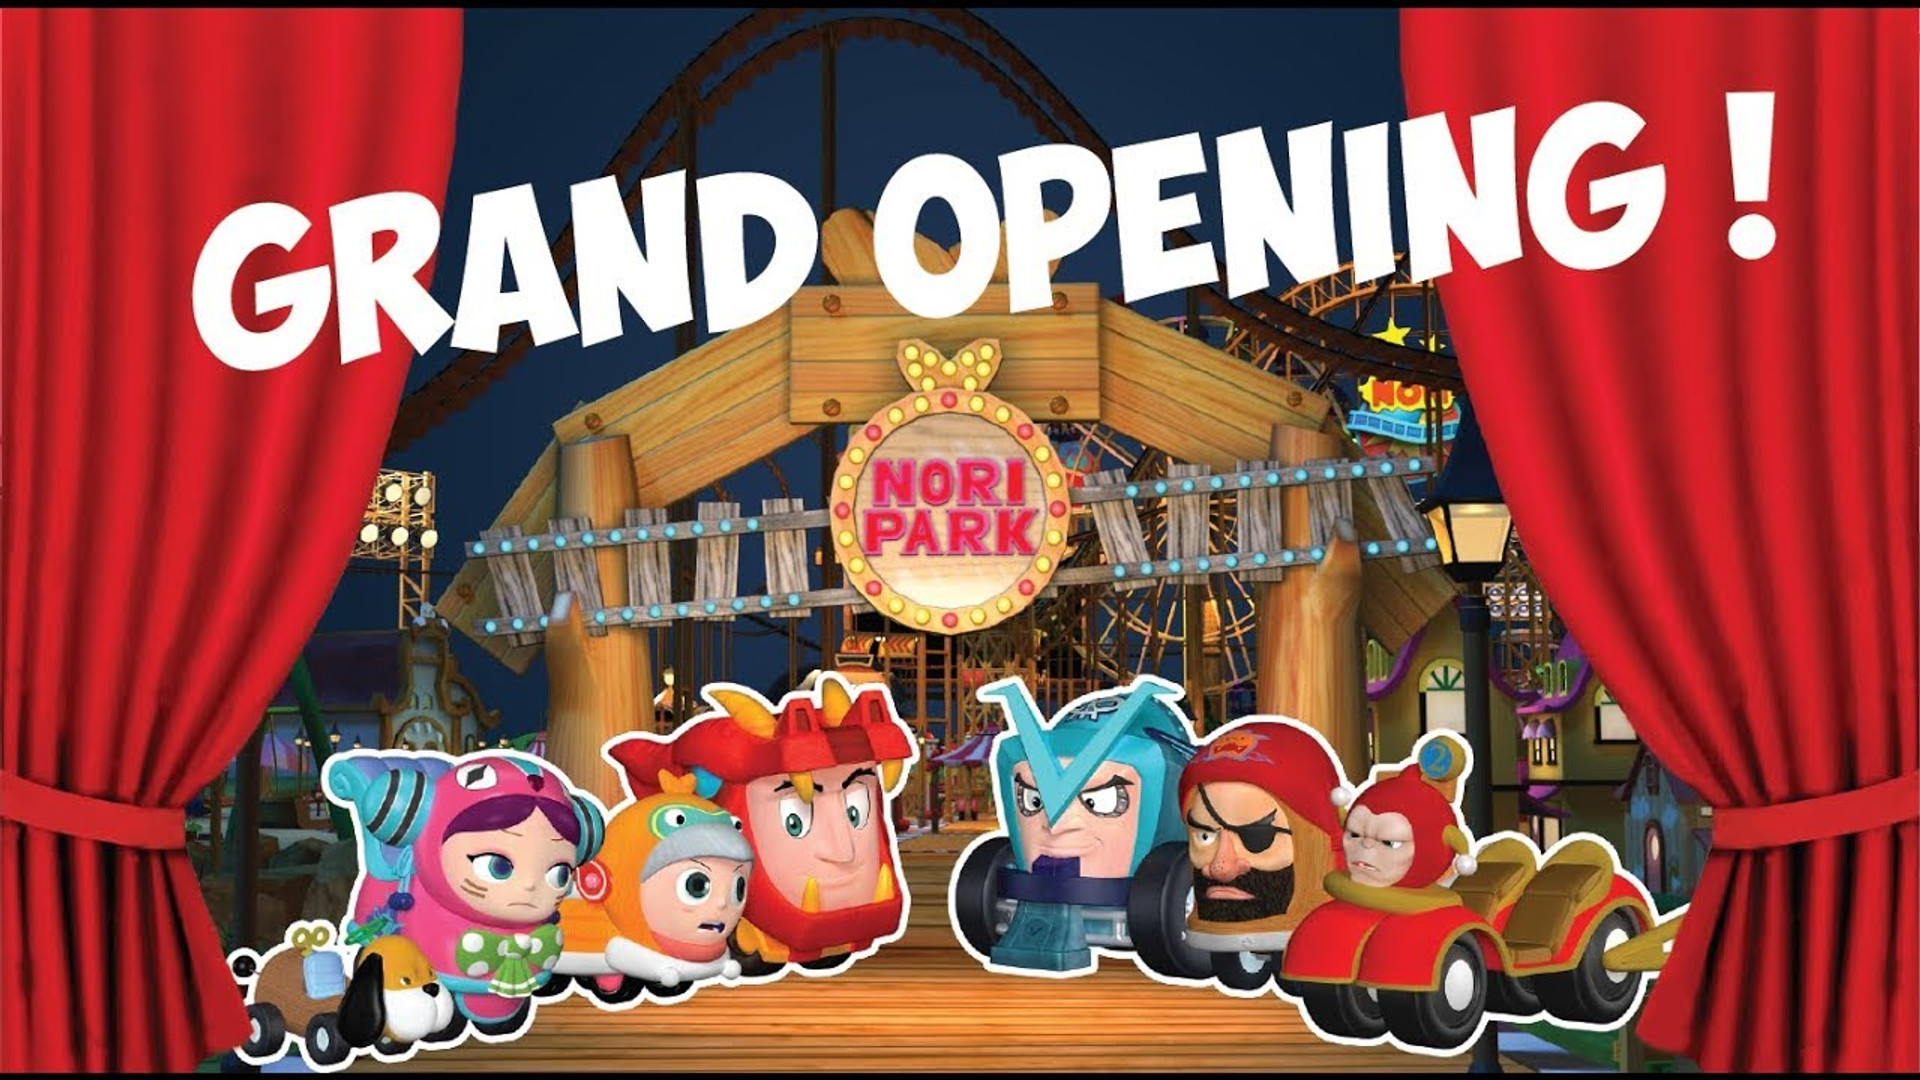 Grand Opening of Nori Rollercoaster Boy